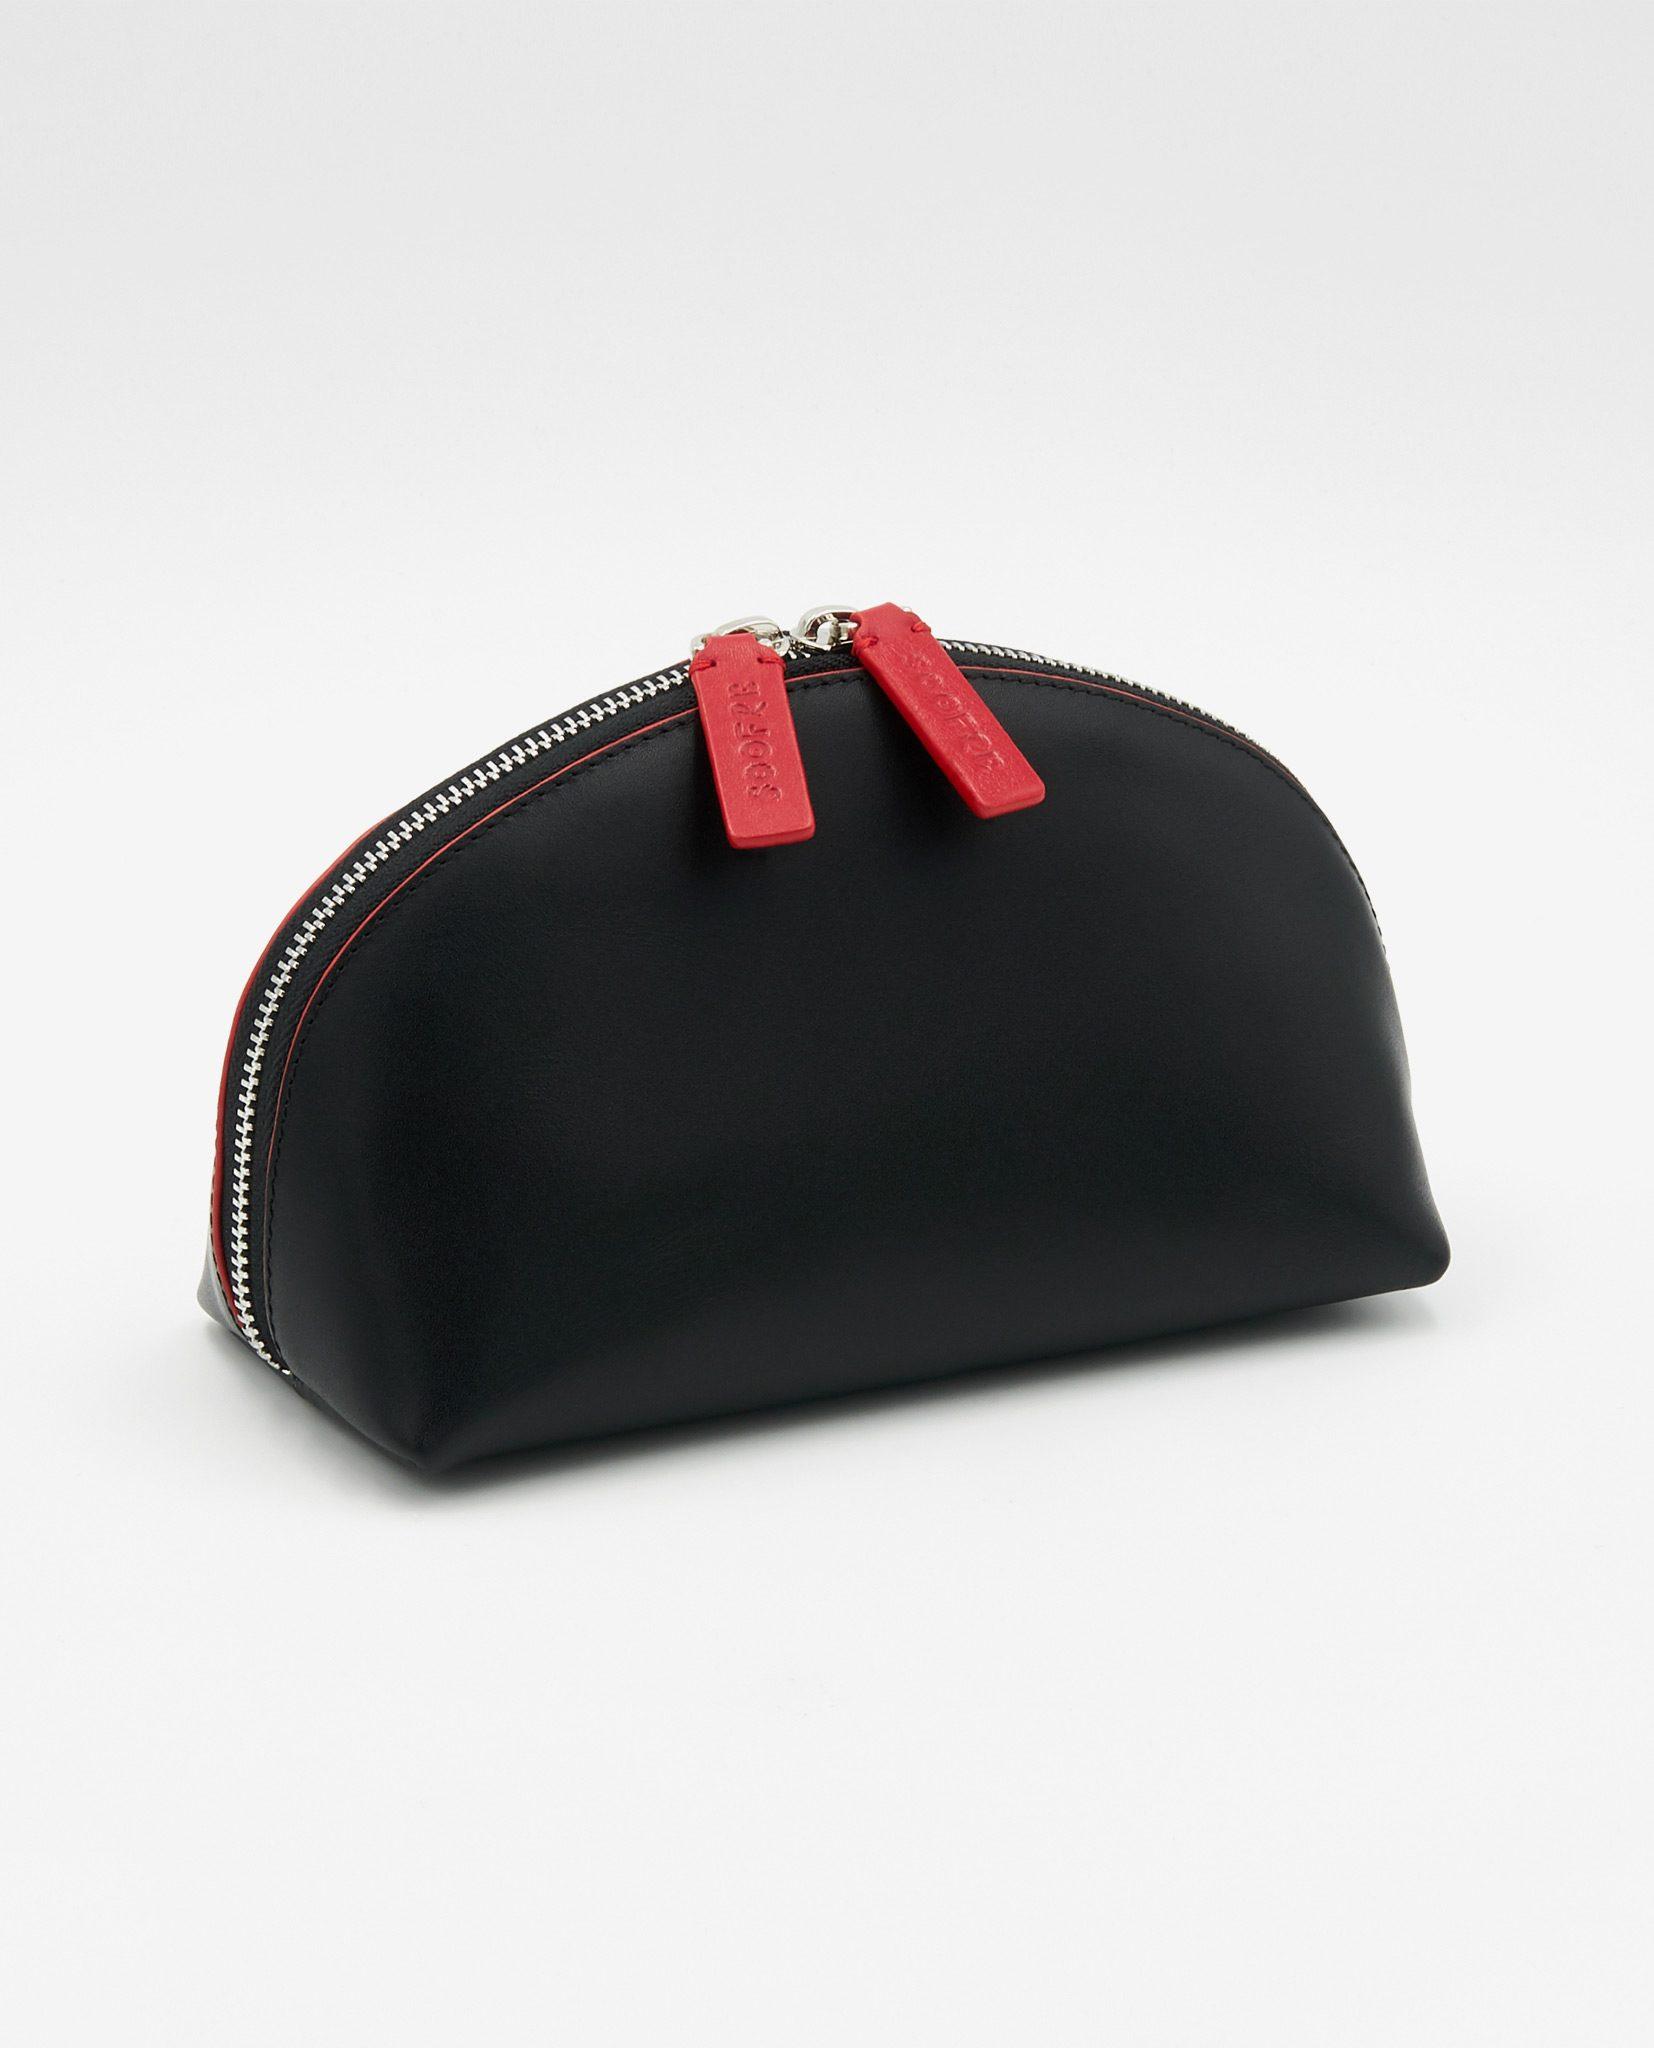 Soofre_Cosmetic-Bag_Black-Red-1